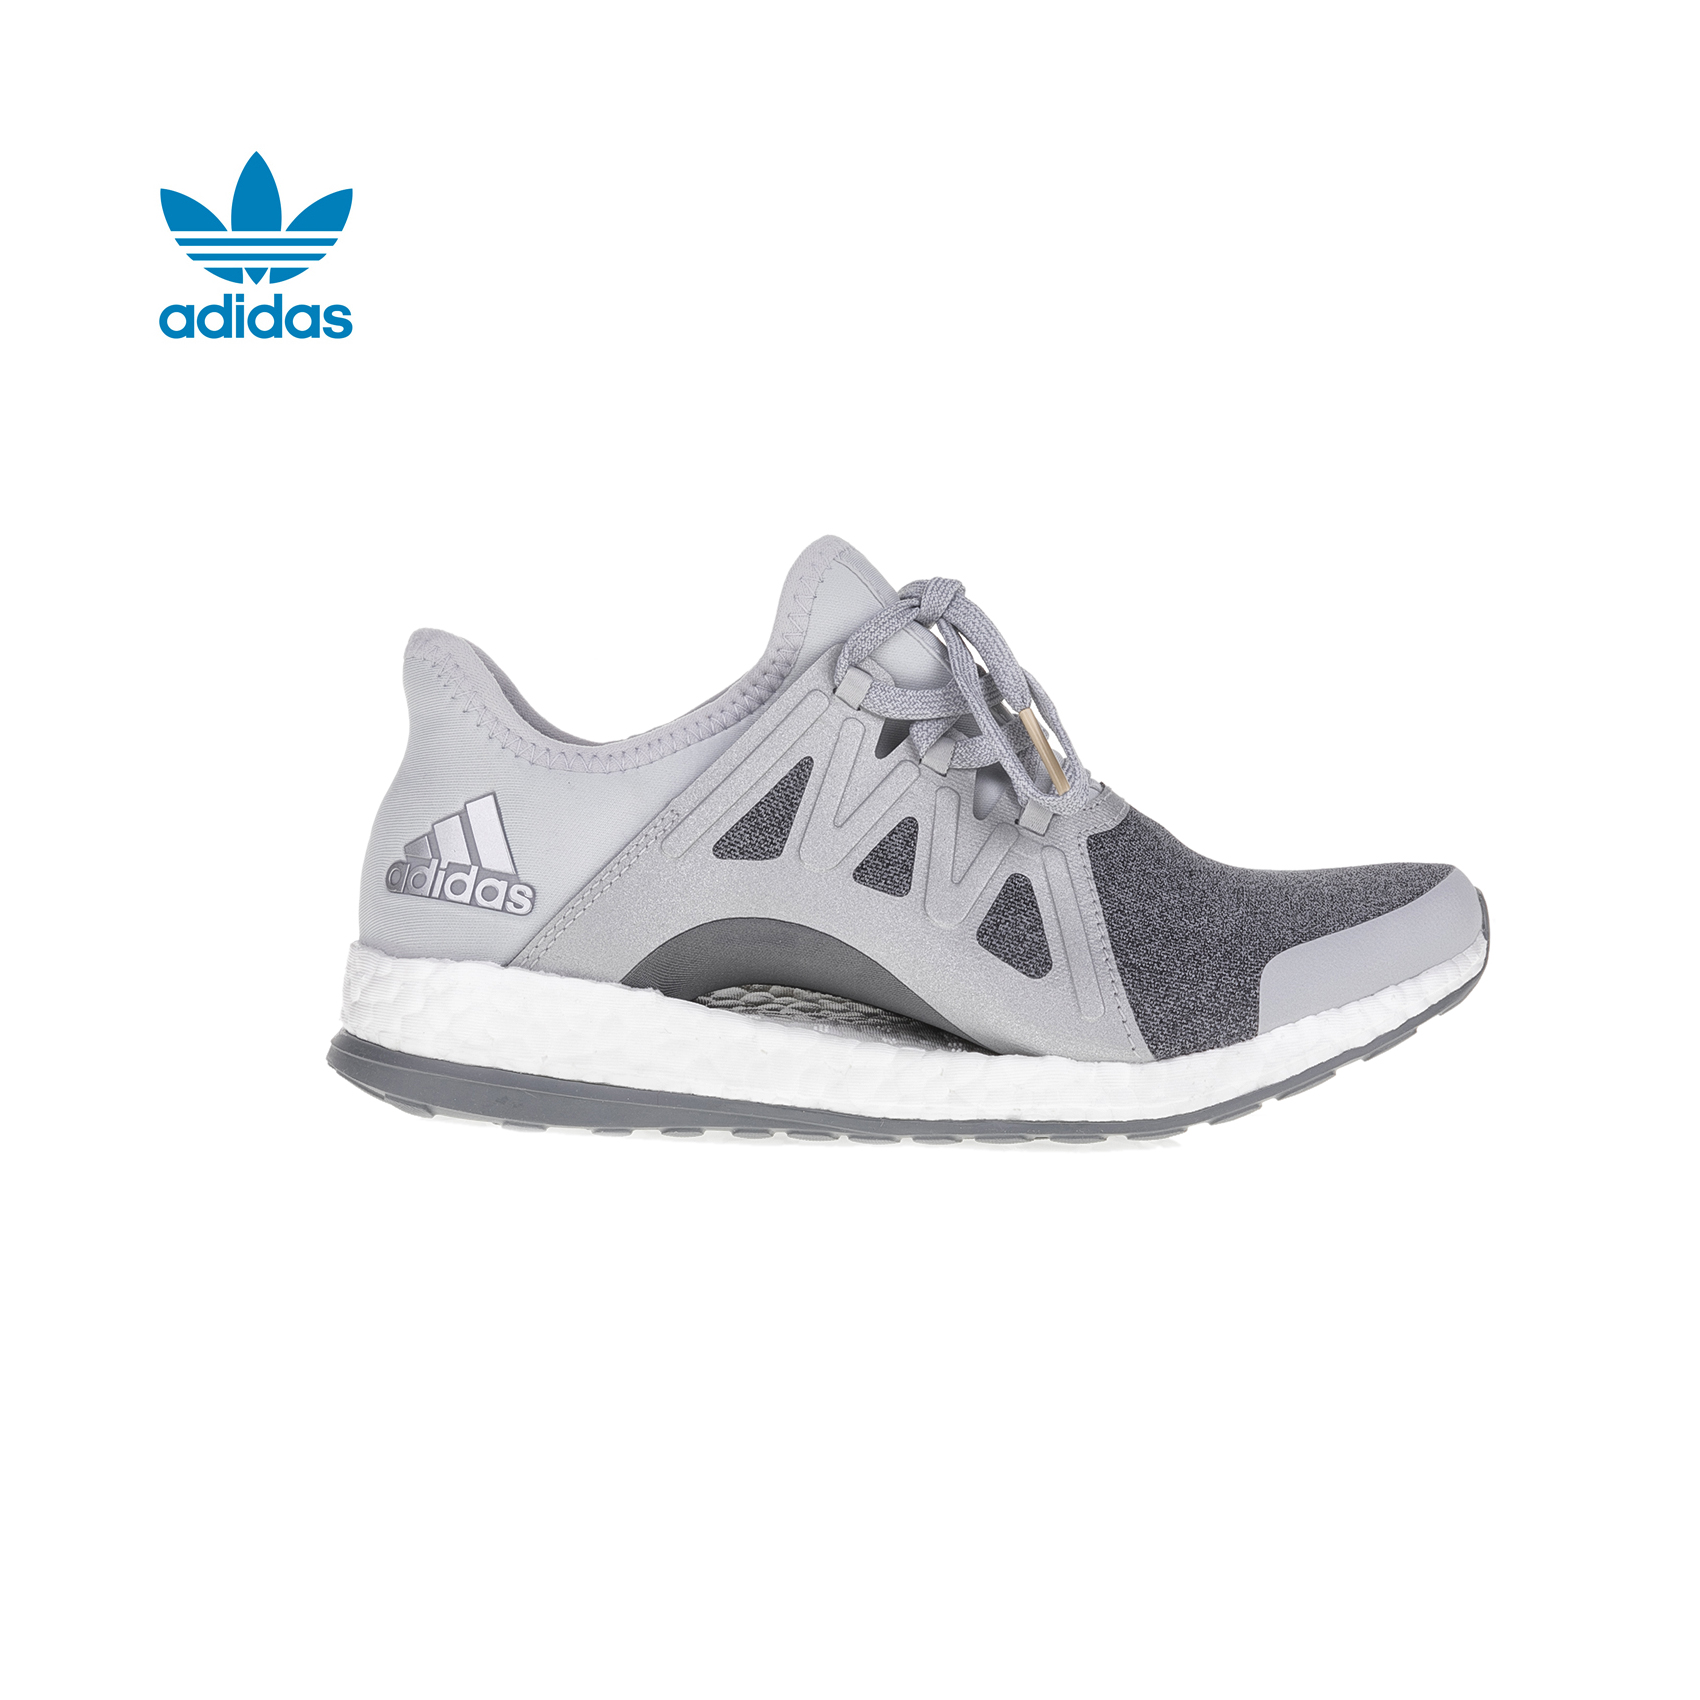 adidas Originals – Γυναικεία παπούτσια adidas PureBOOST X 2 γκρι